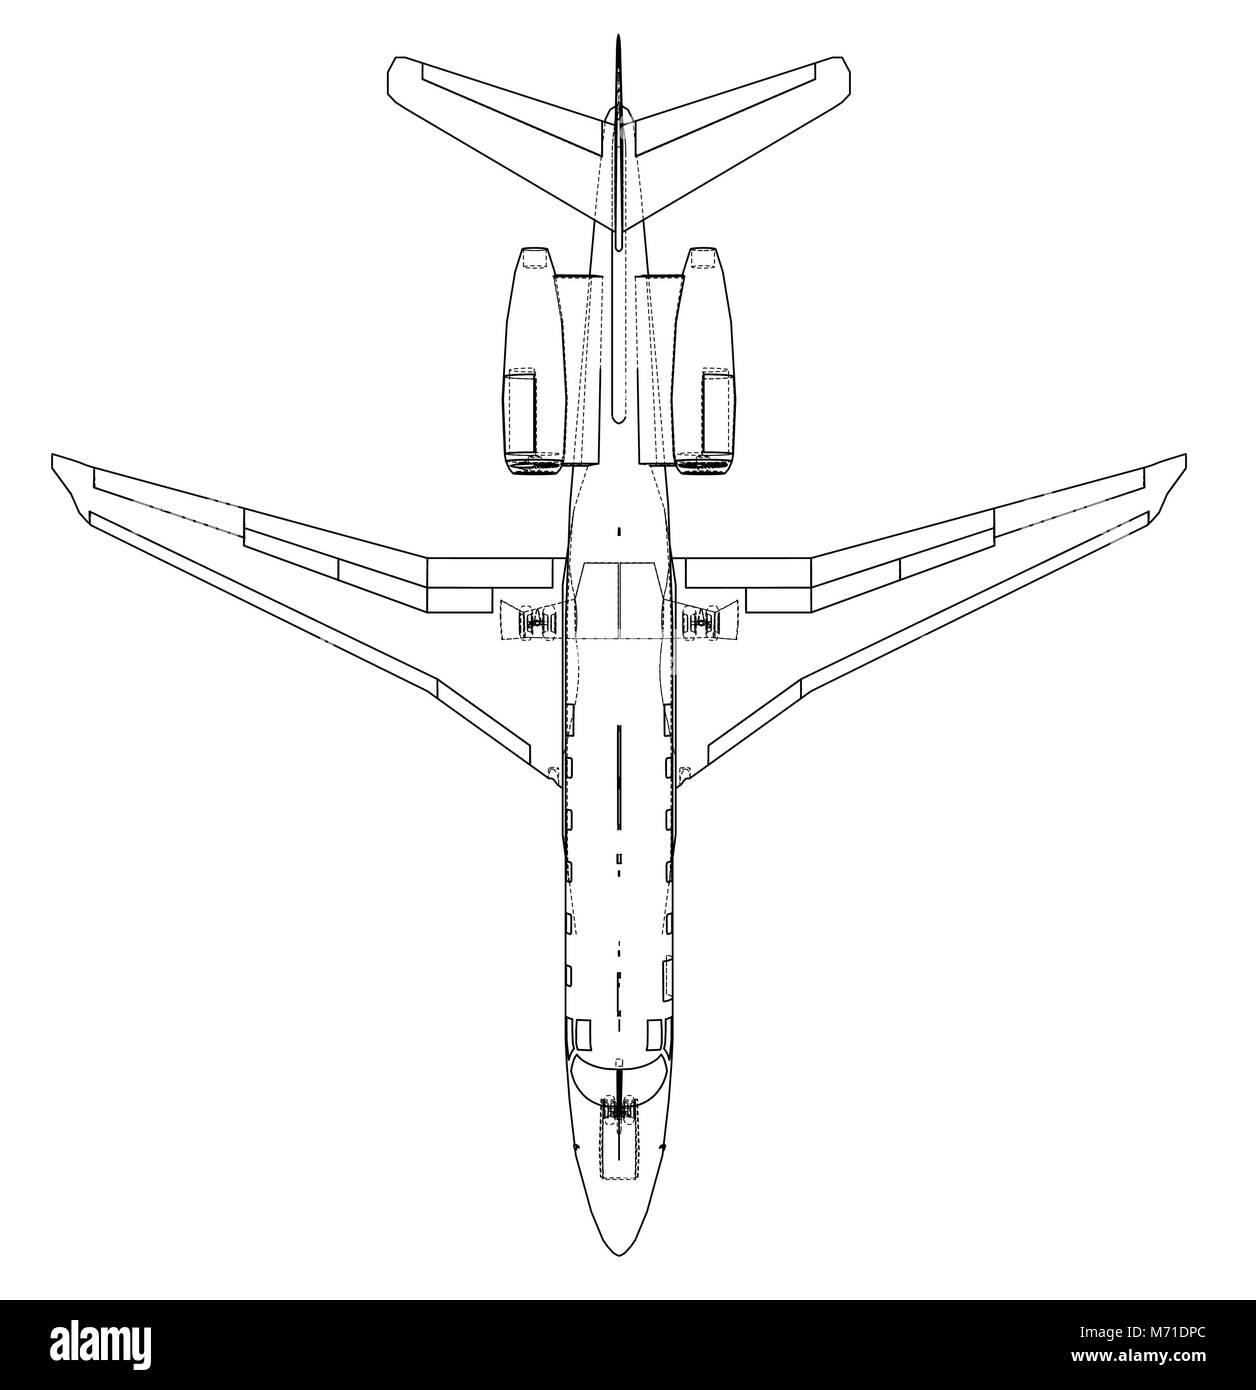 Airplane blueprint vector stock vector art illustration vector airplane blueprint vector malvernweather Choice Image